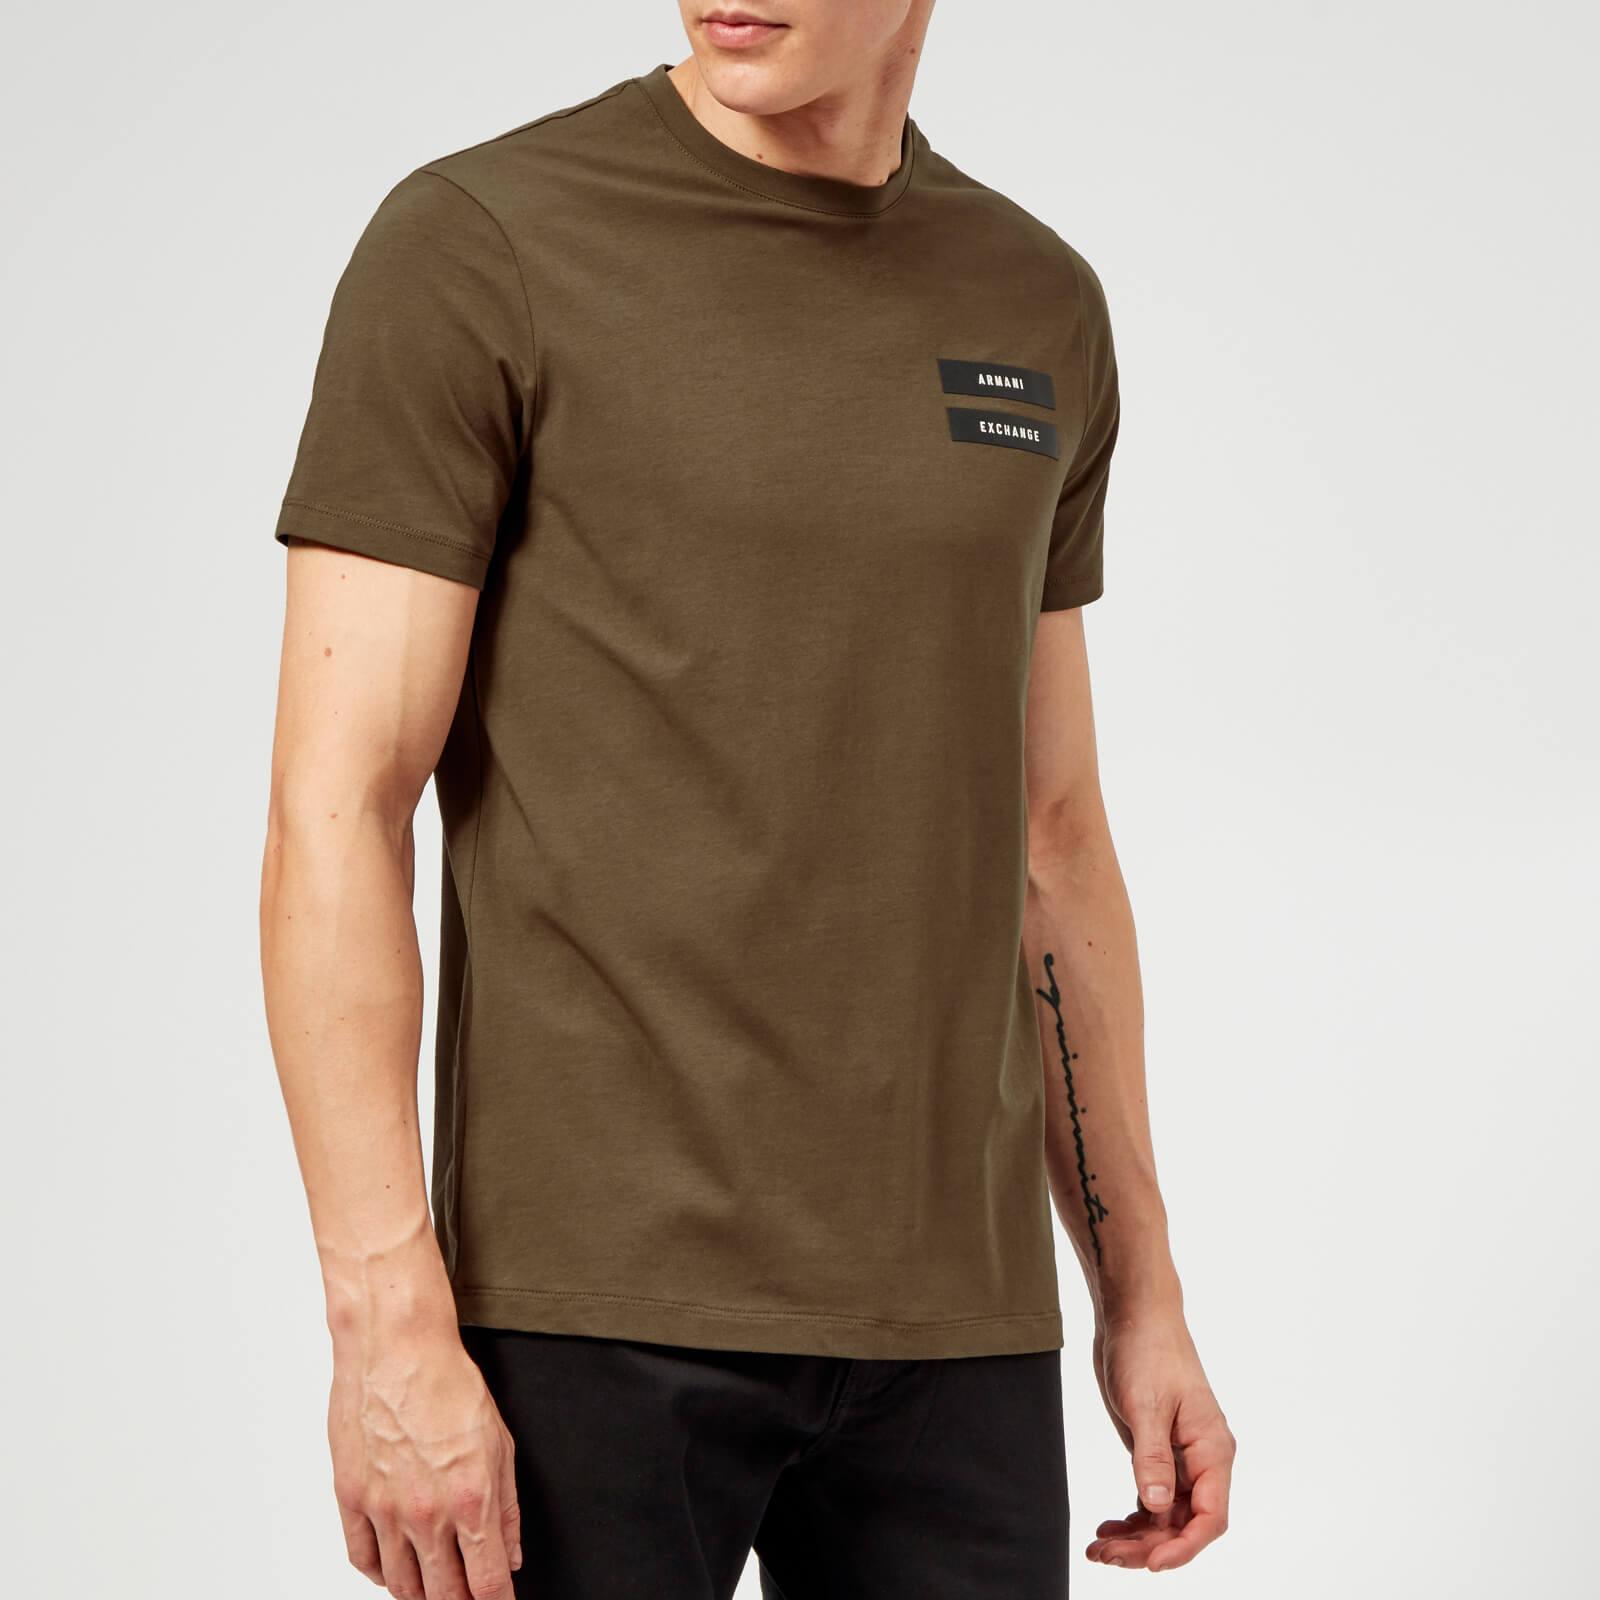 556e70e818 Armani Exchange Men's Military Logo T-Shirt - Wren Clothing | TheHut.com